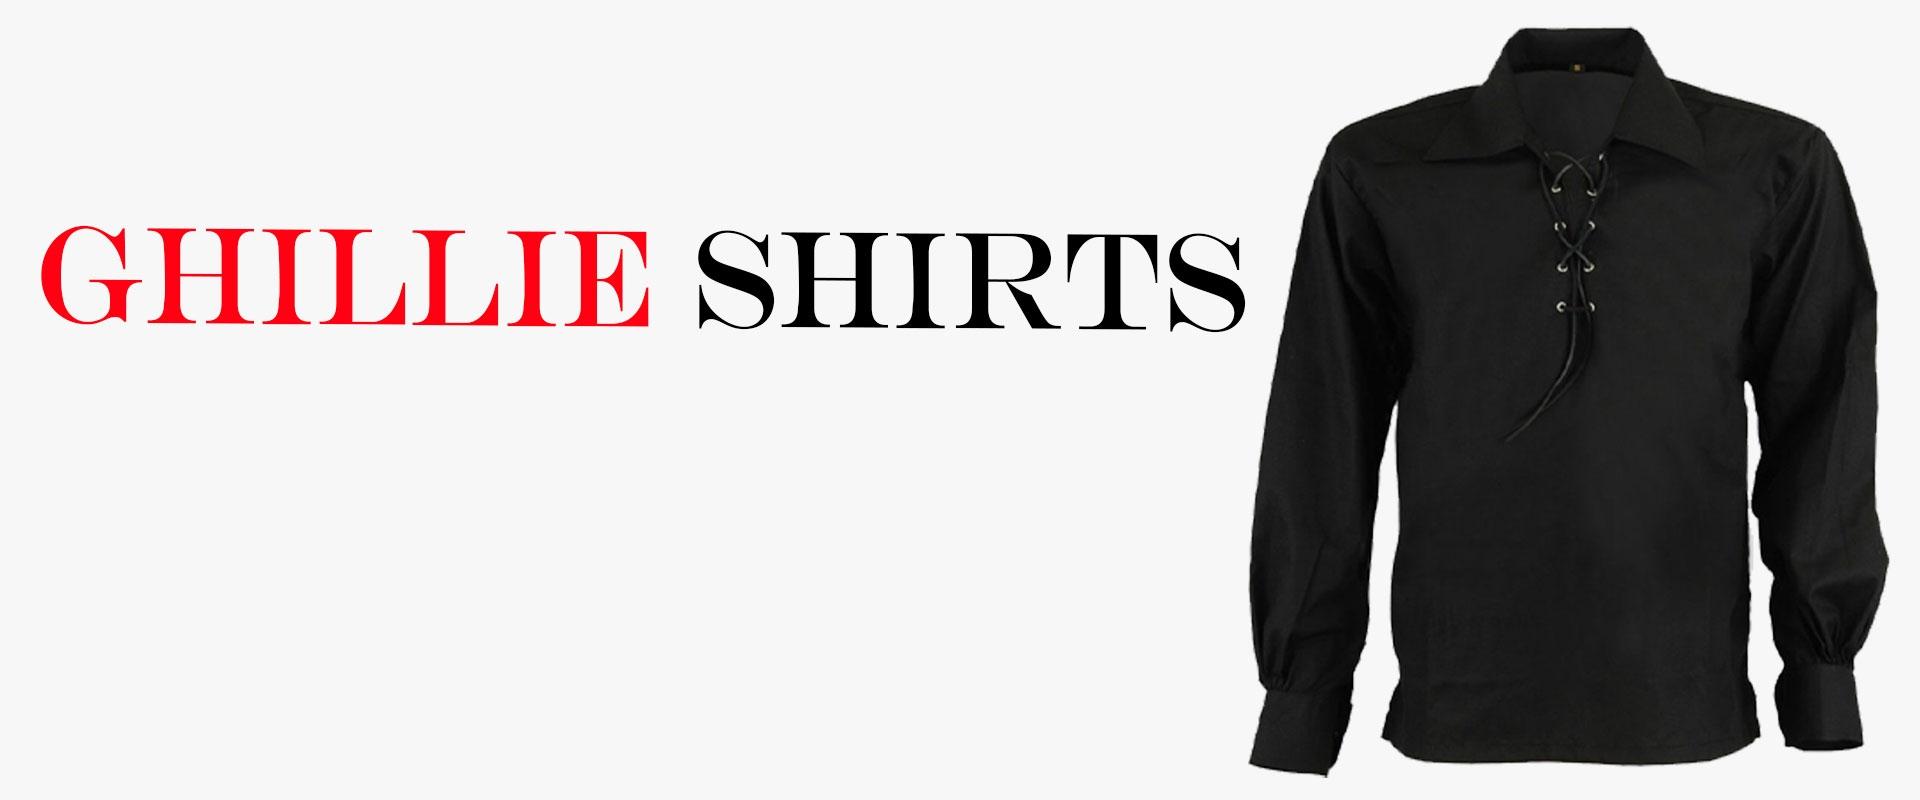 Ghillie Shirts